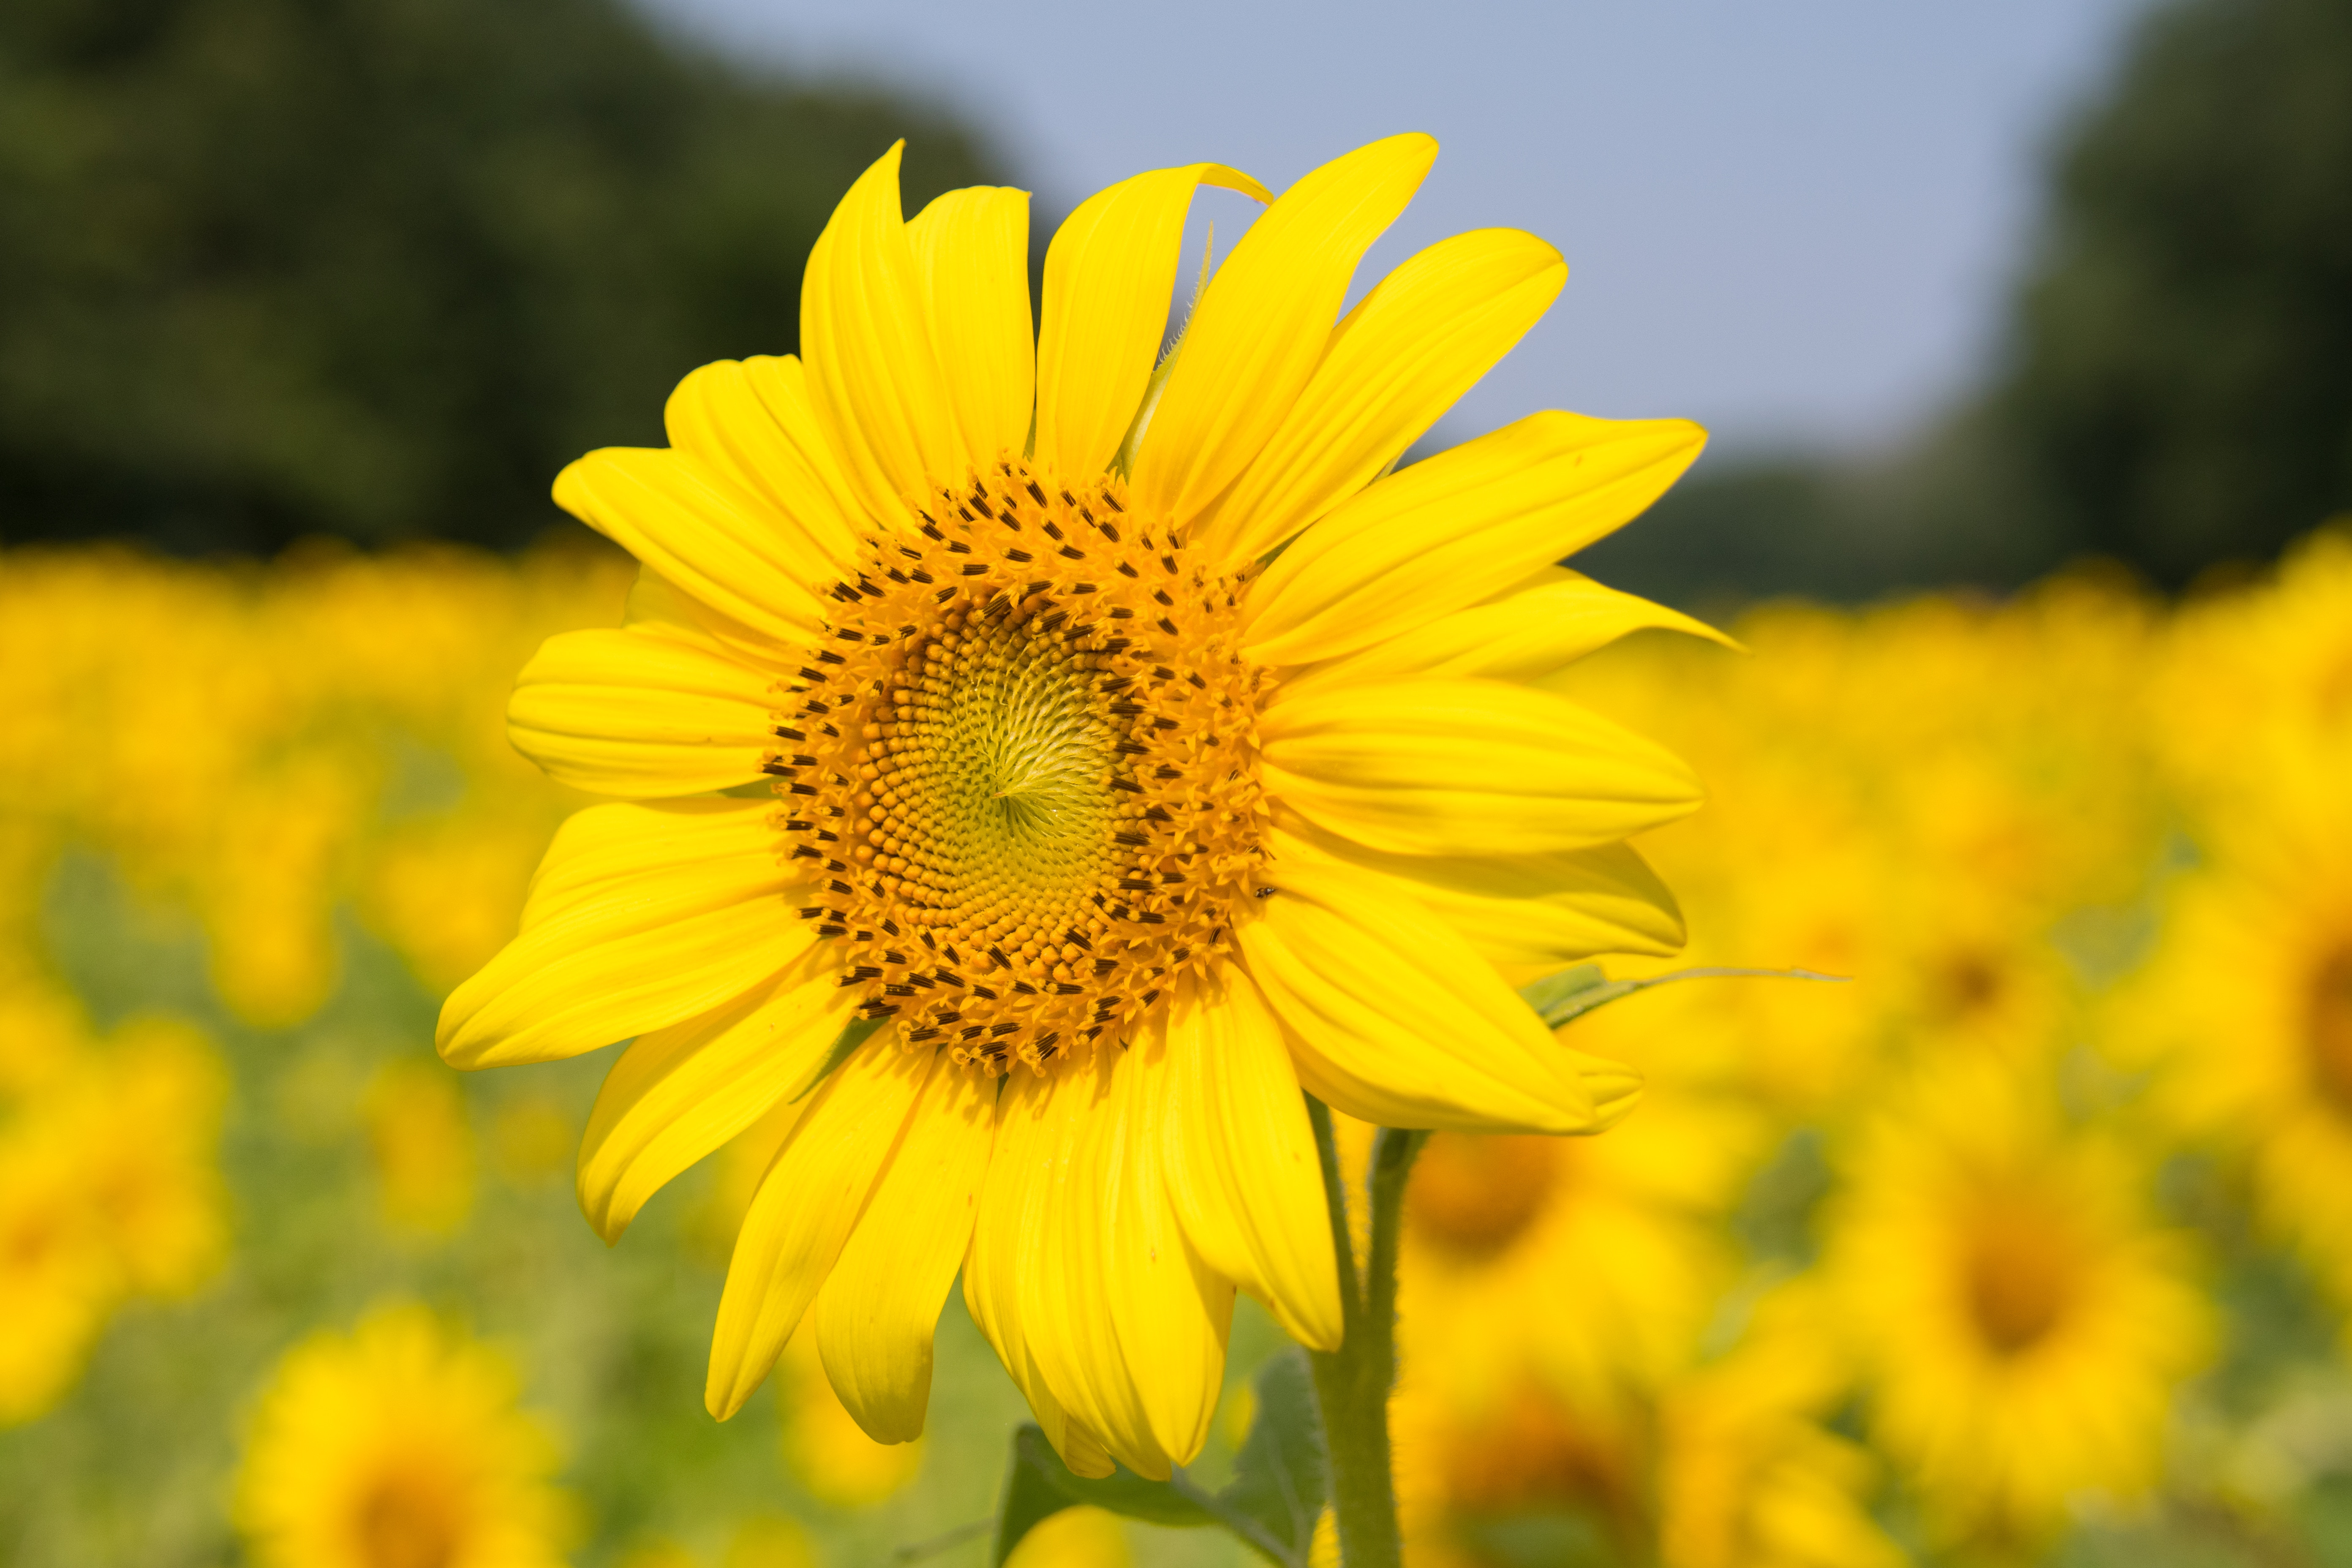 Sunflowers and Nudists